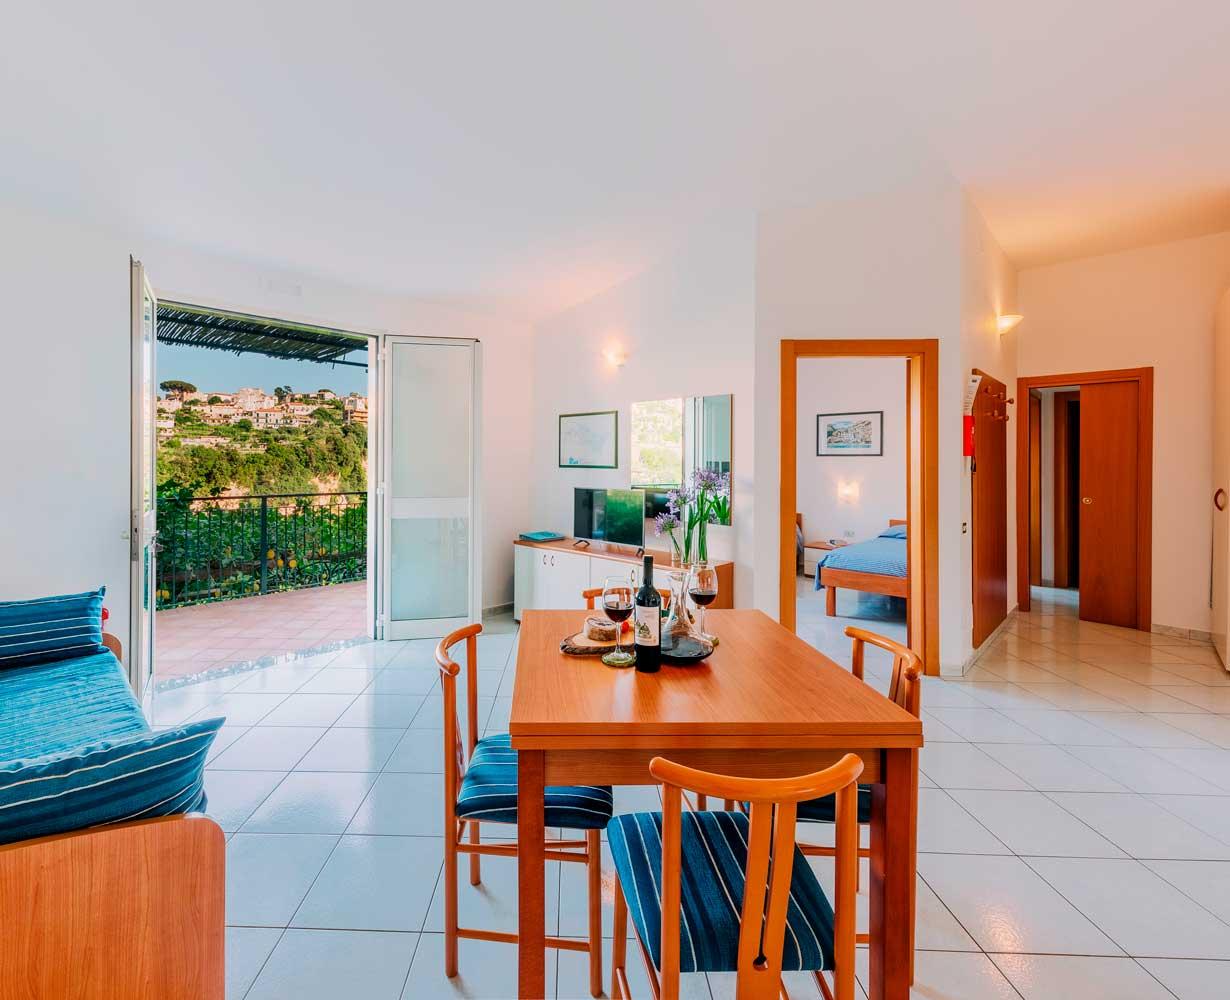 Appartamenti per vacanze Costiera Amalfitana